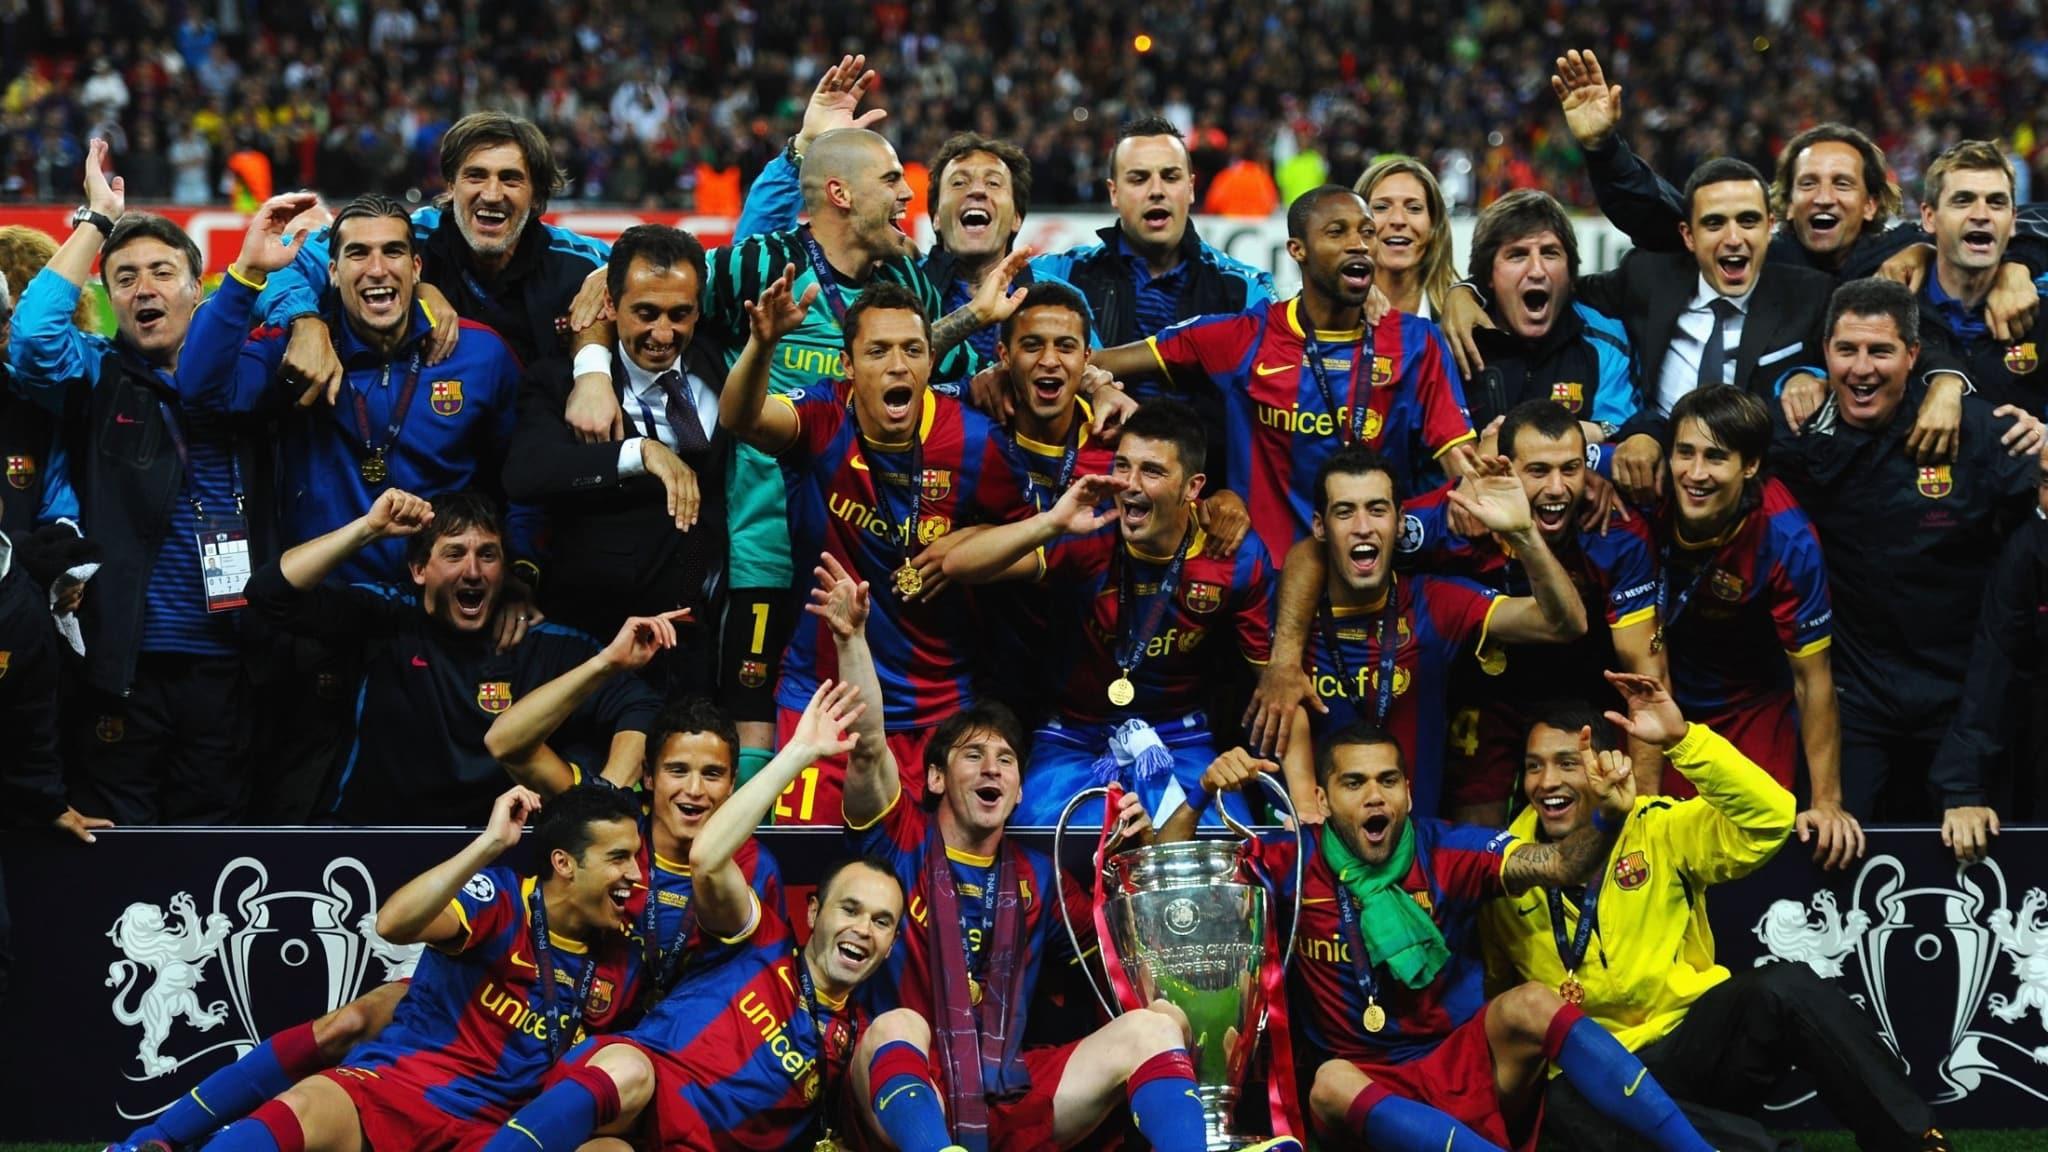 Championsleague Sieger